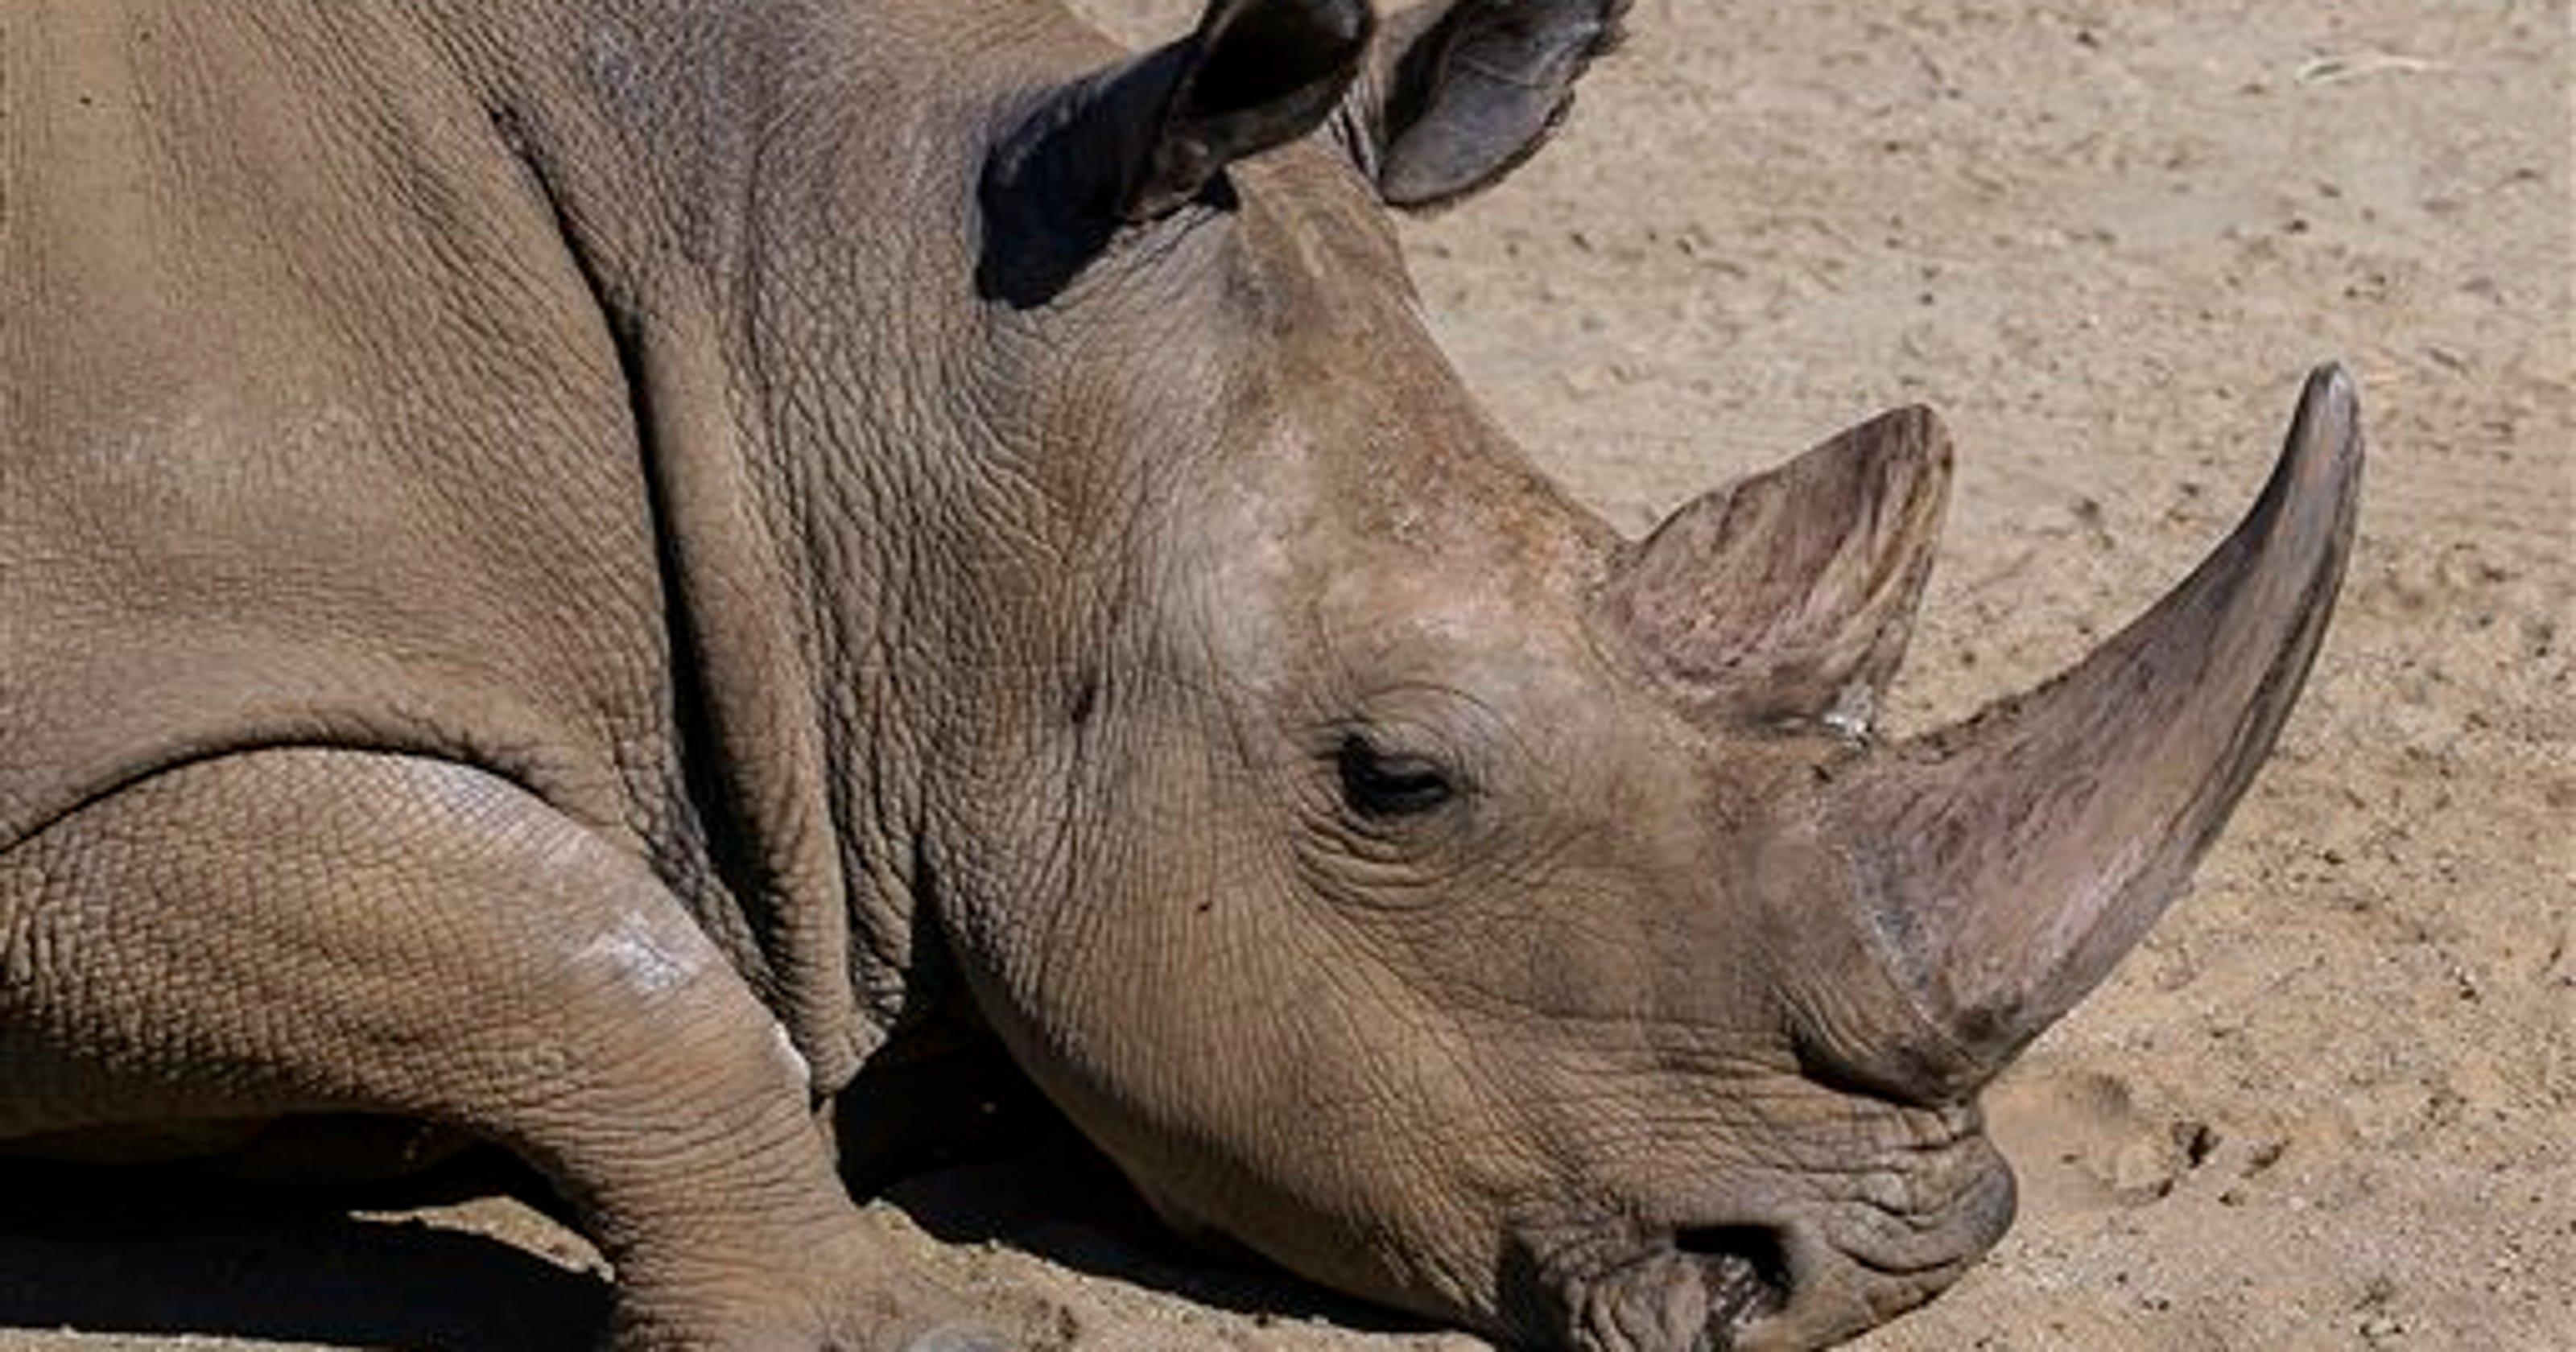 Rare northern white rhino dies, only 5 left in world